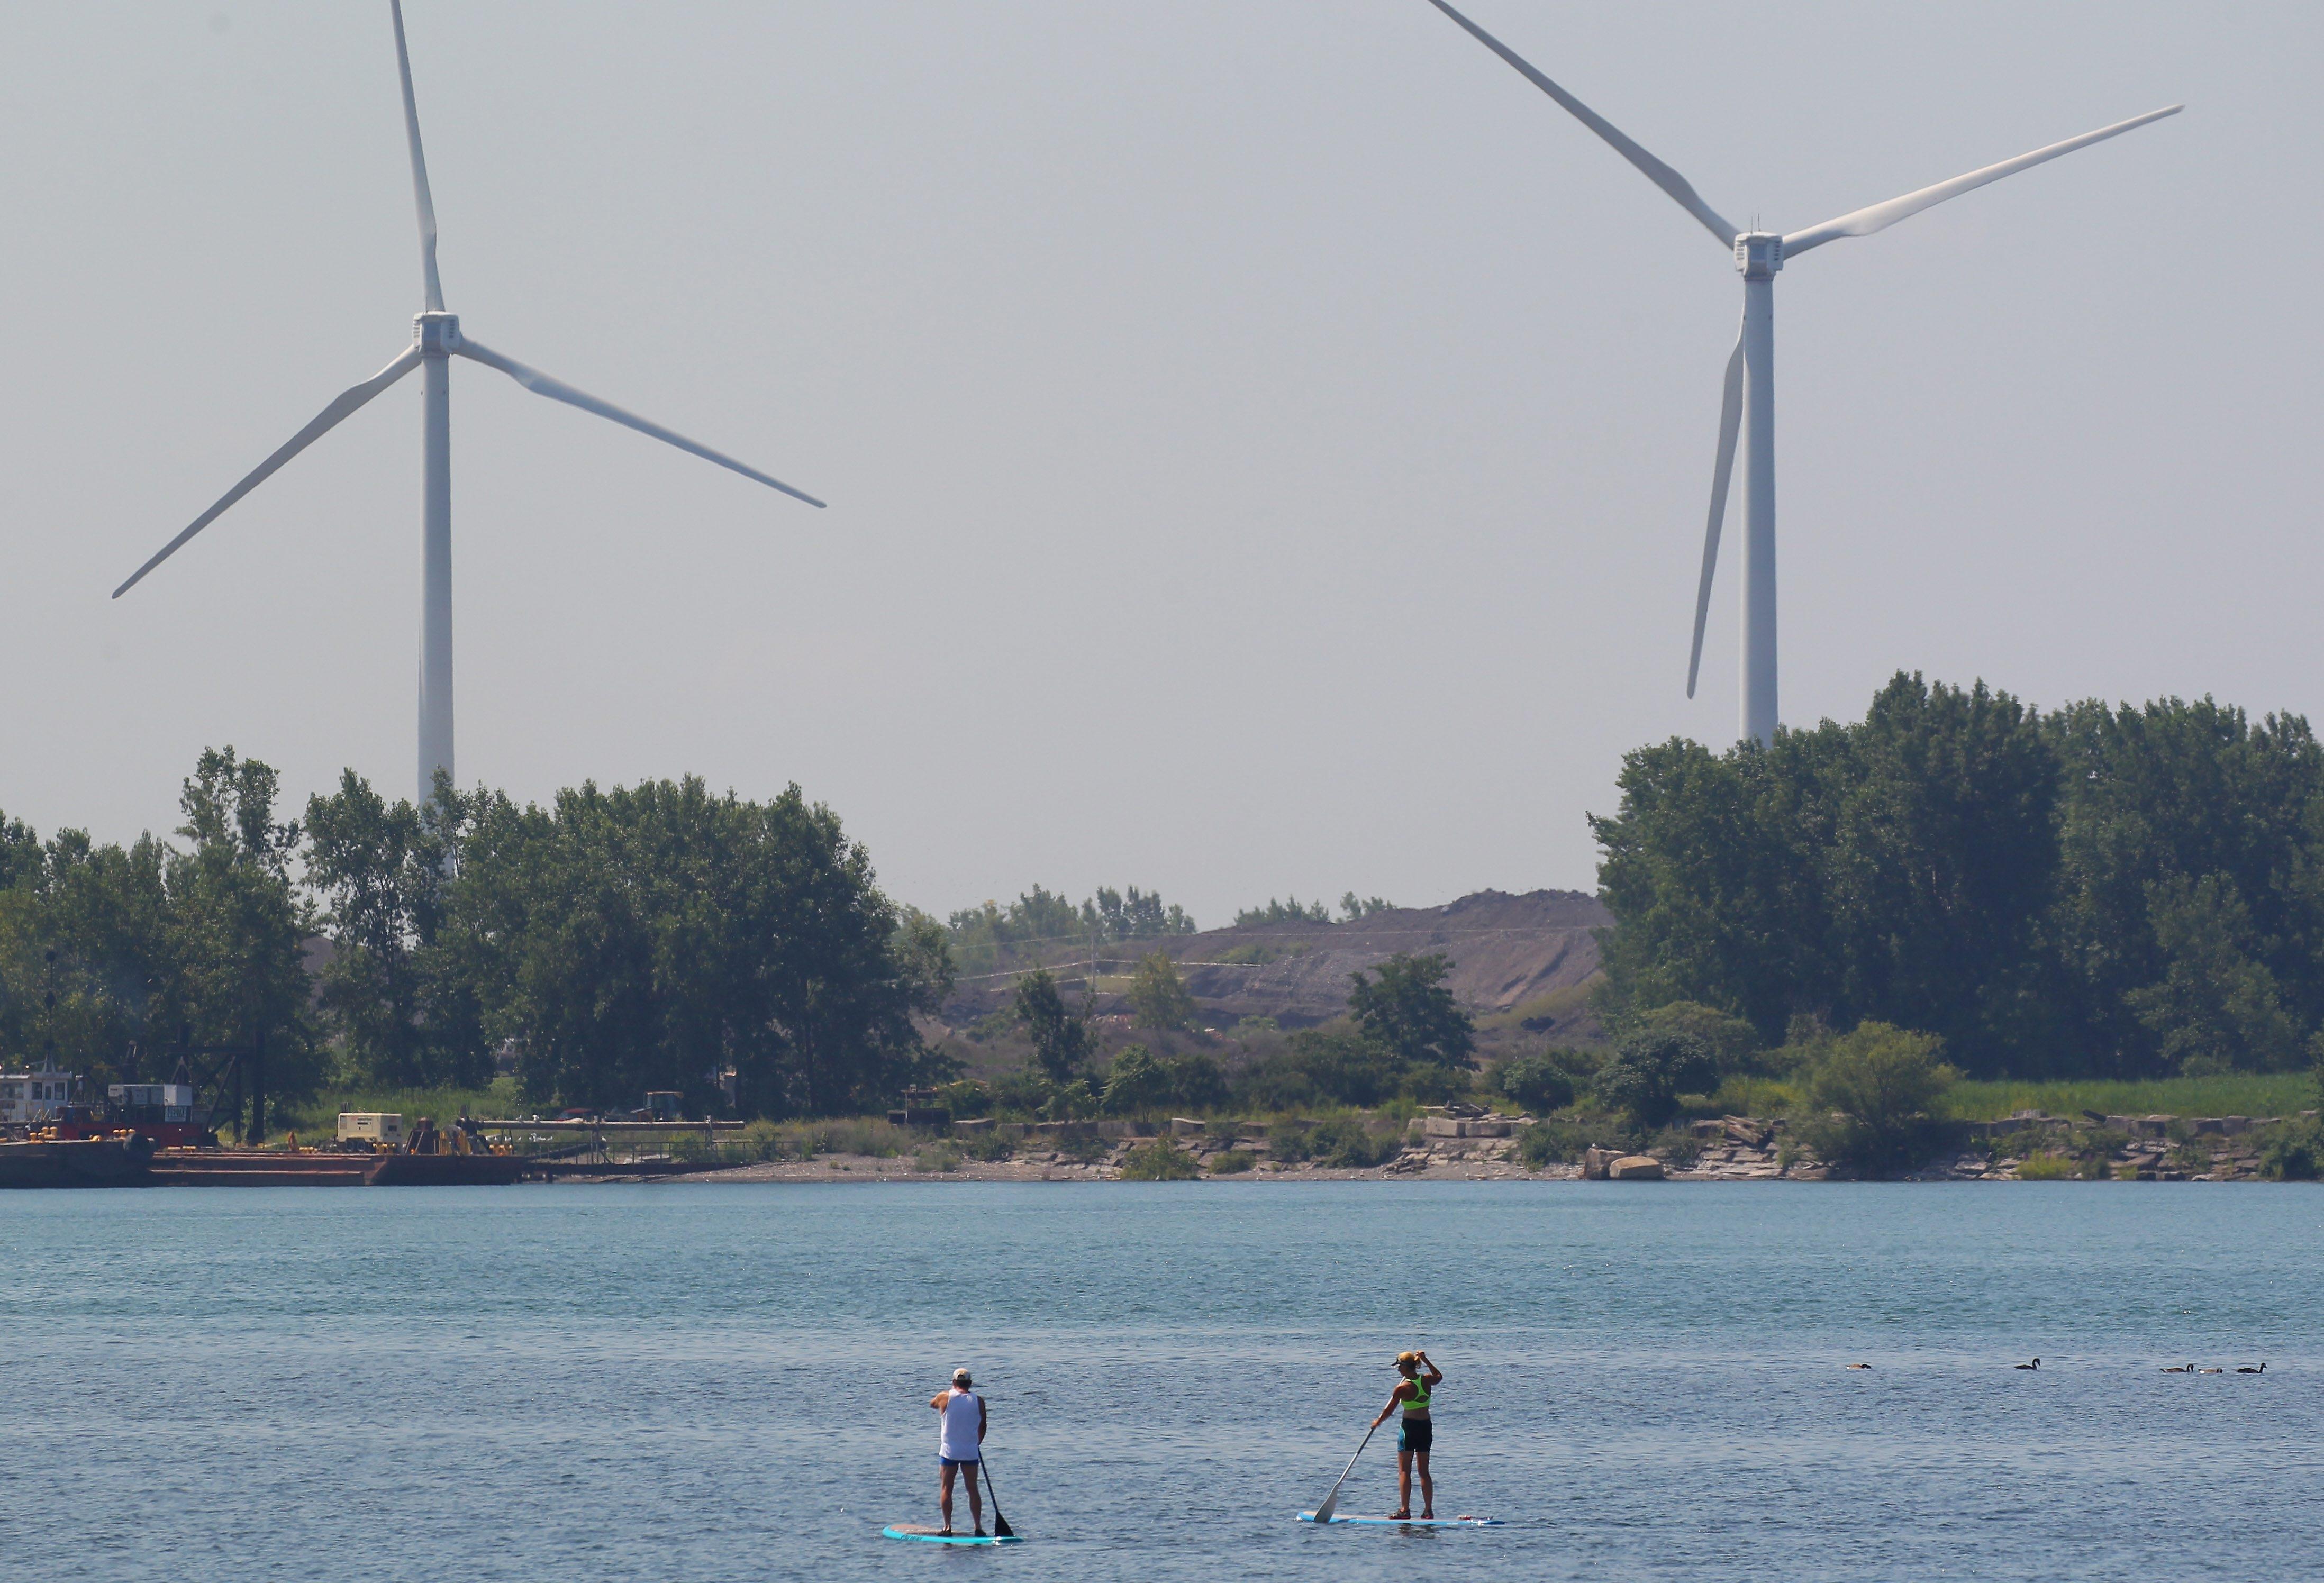 Great Lakes neighbor bullish on fresh water – The Buffalo News